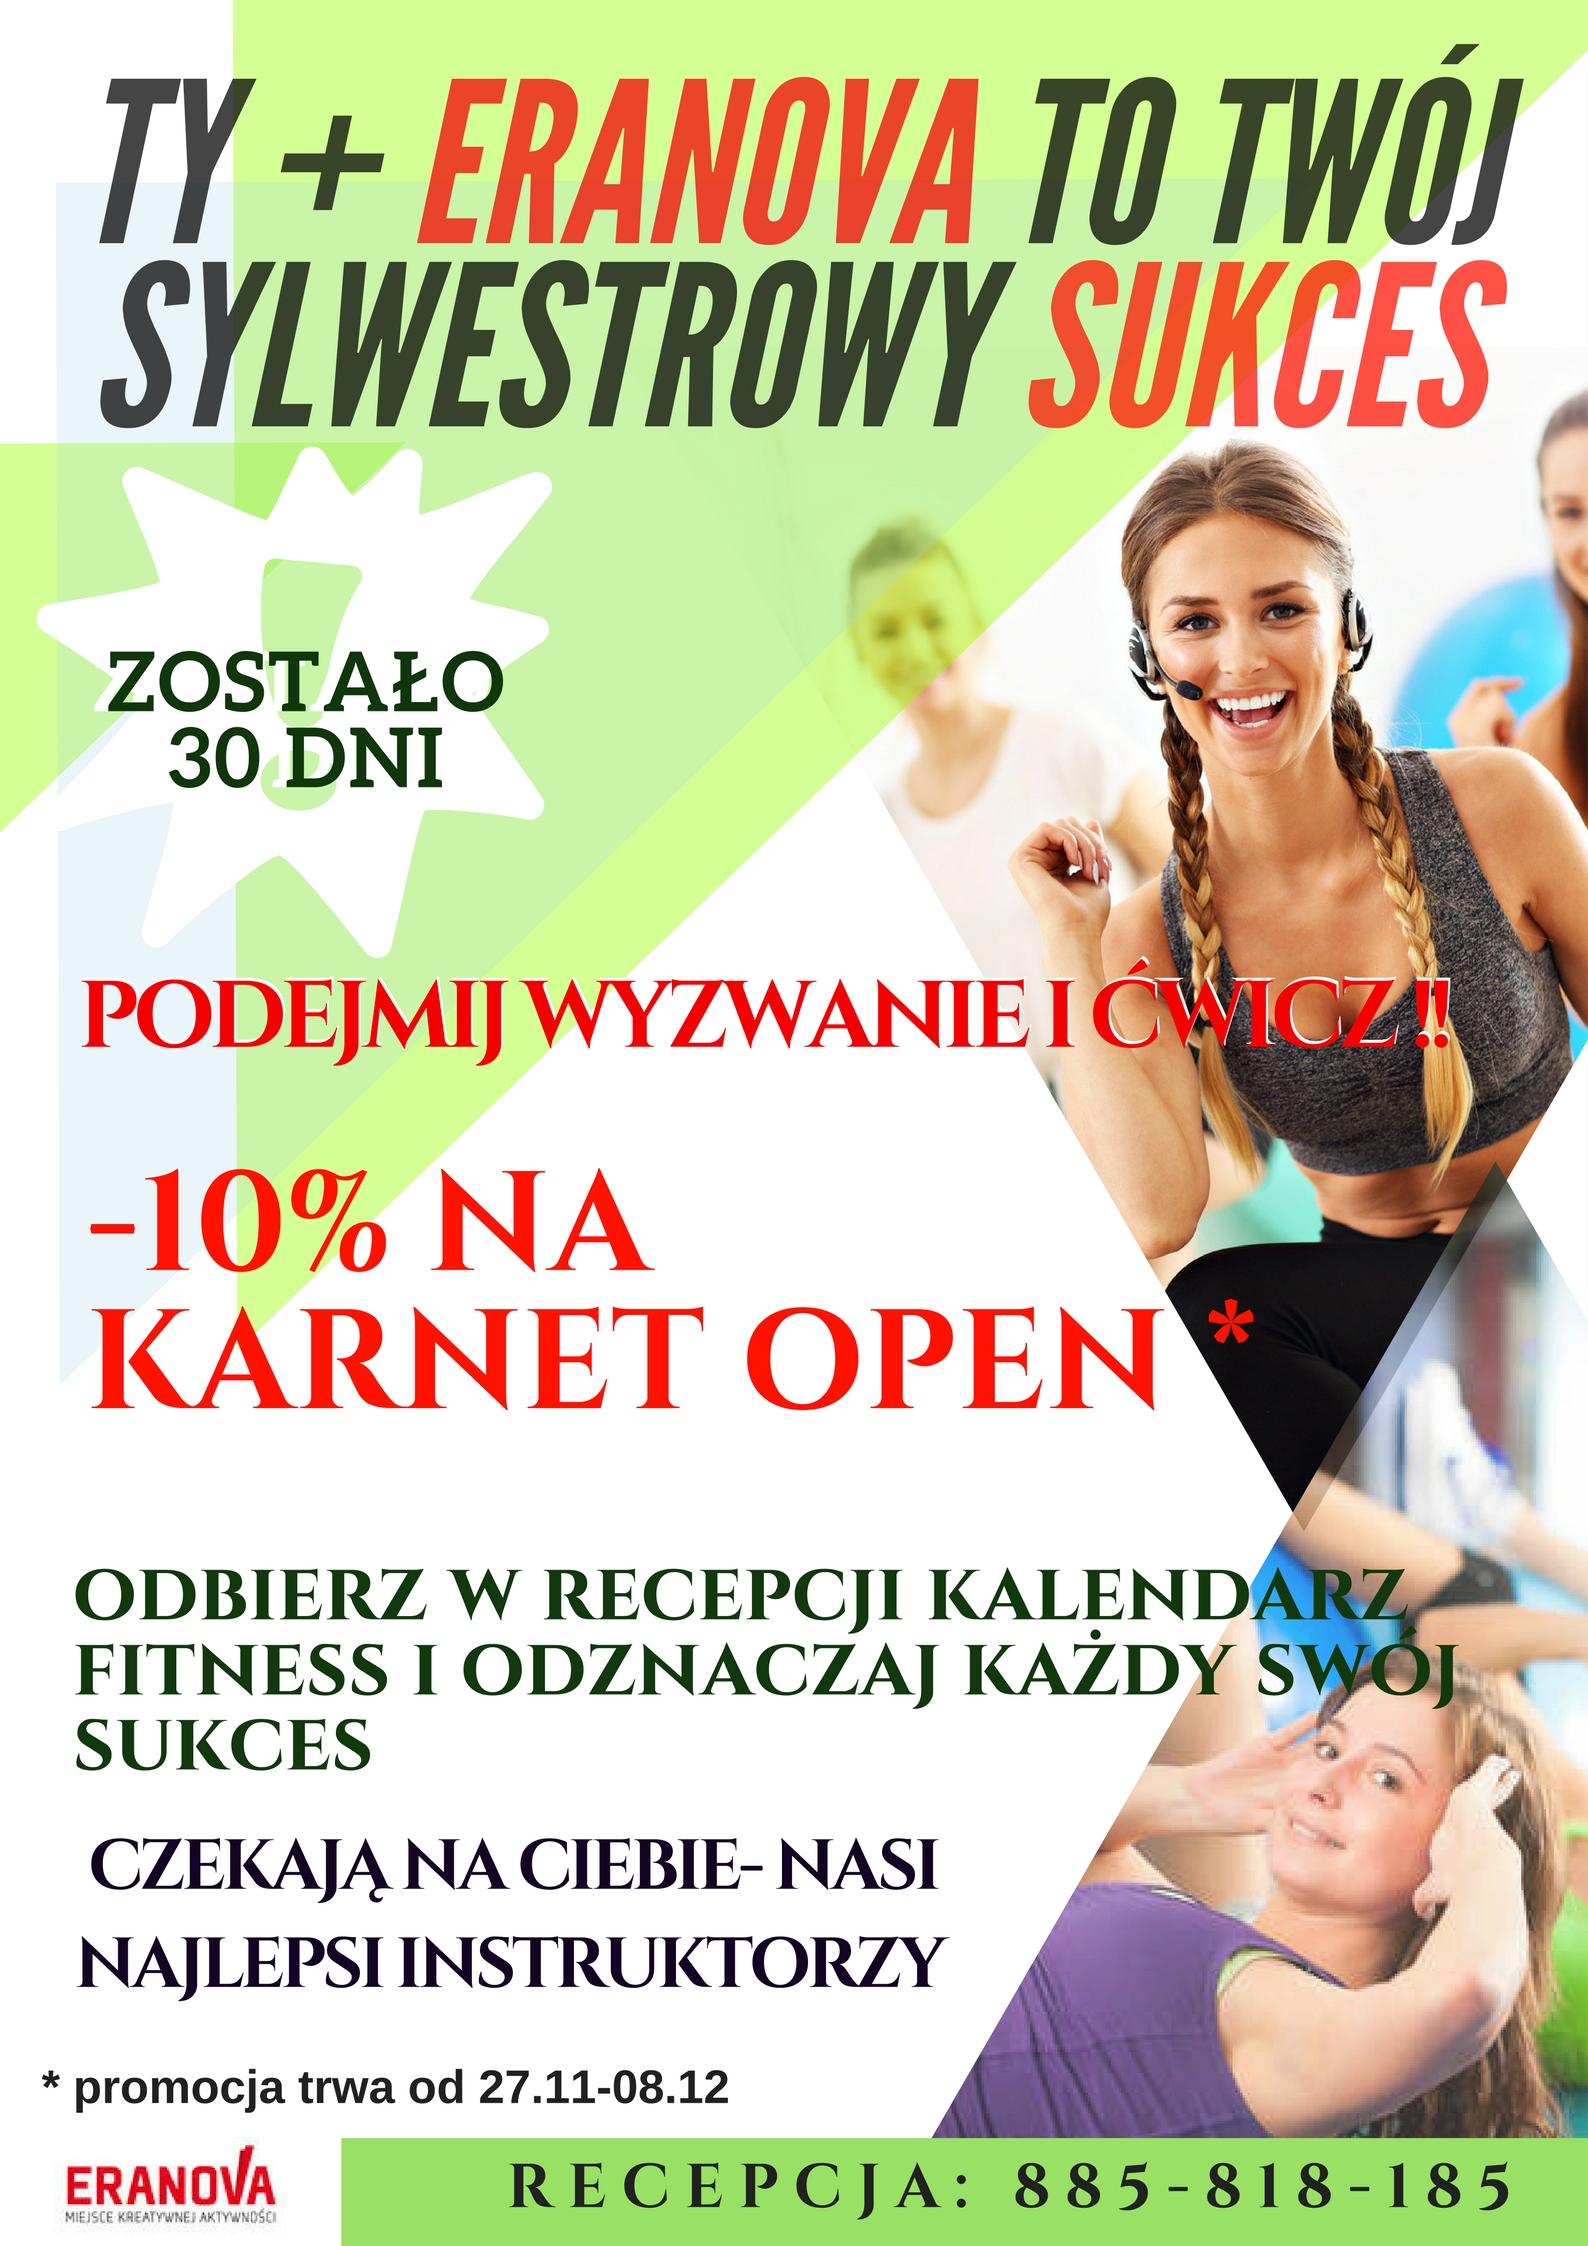 http://m.eranova.pl/2017/11/orig/trimfuj-z-eranova-na-sylwestra-2-2514.jpg